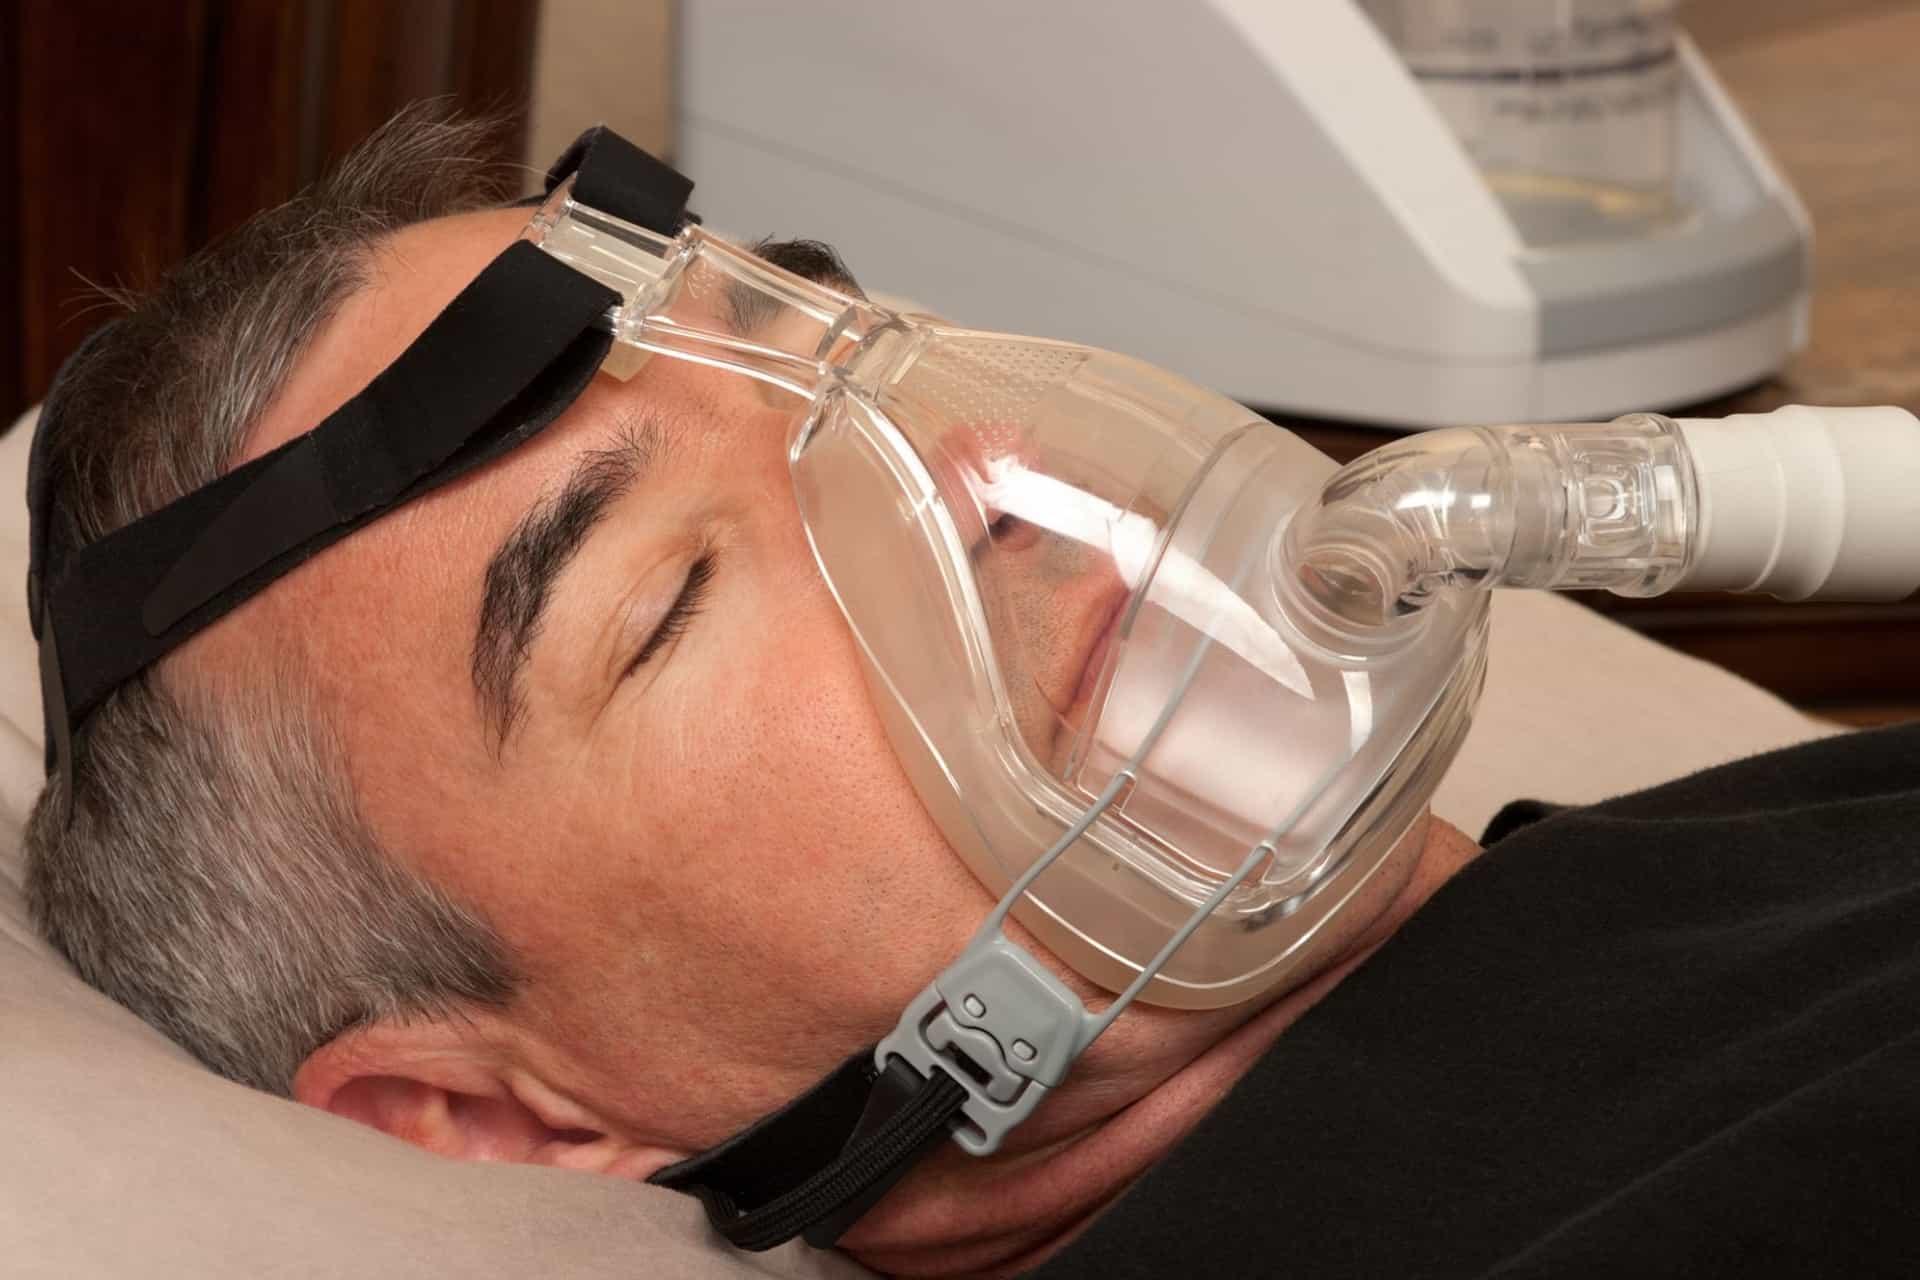 Man sleeping with a CPAP device to treat sleep apnea.